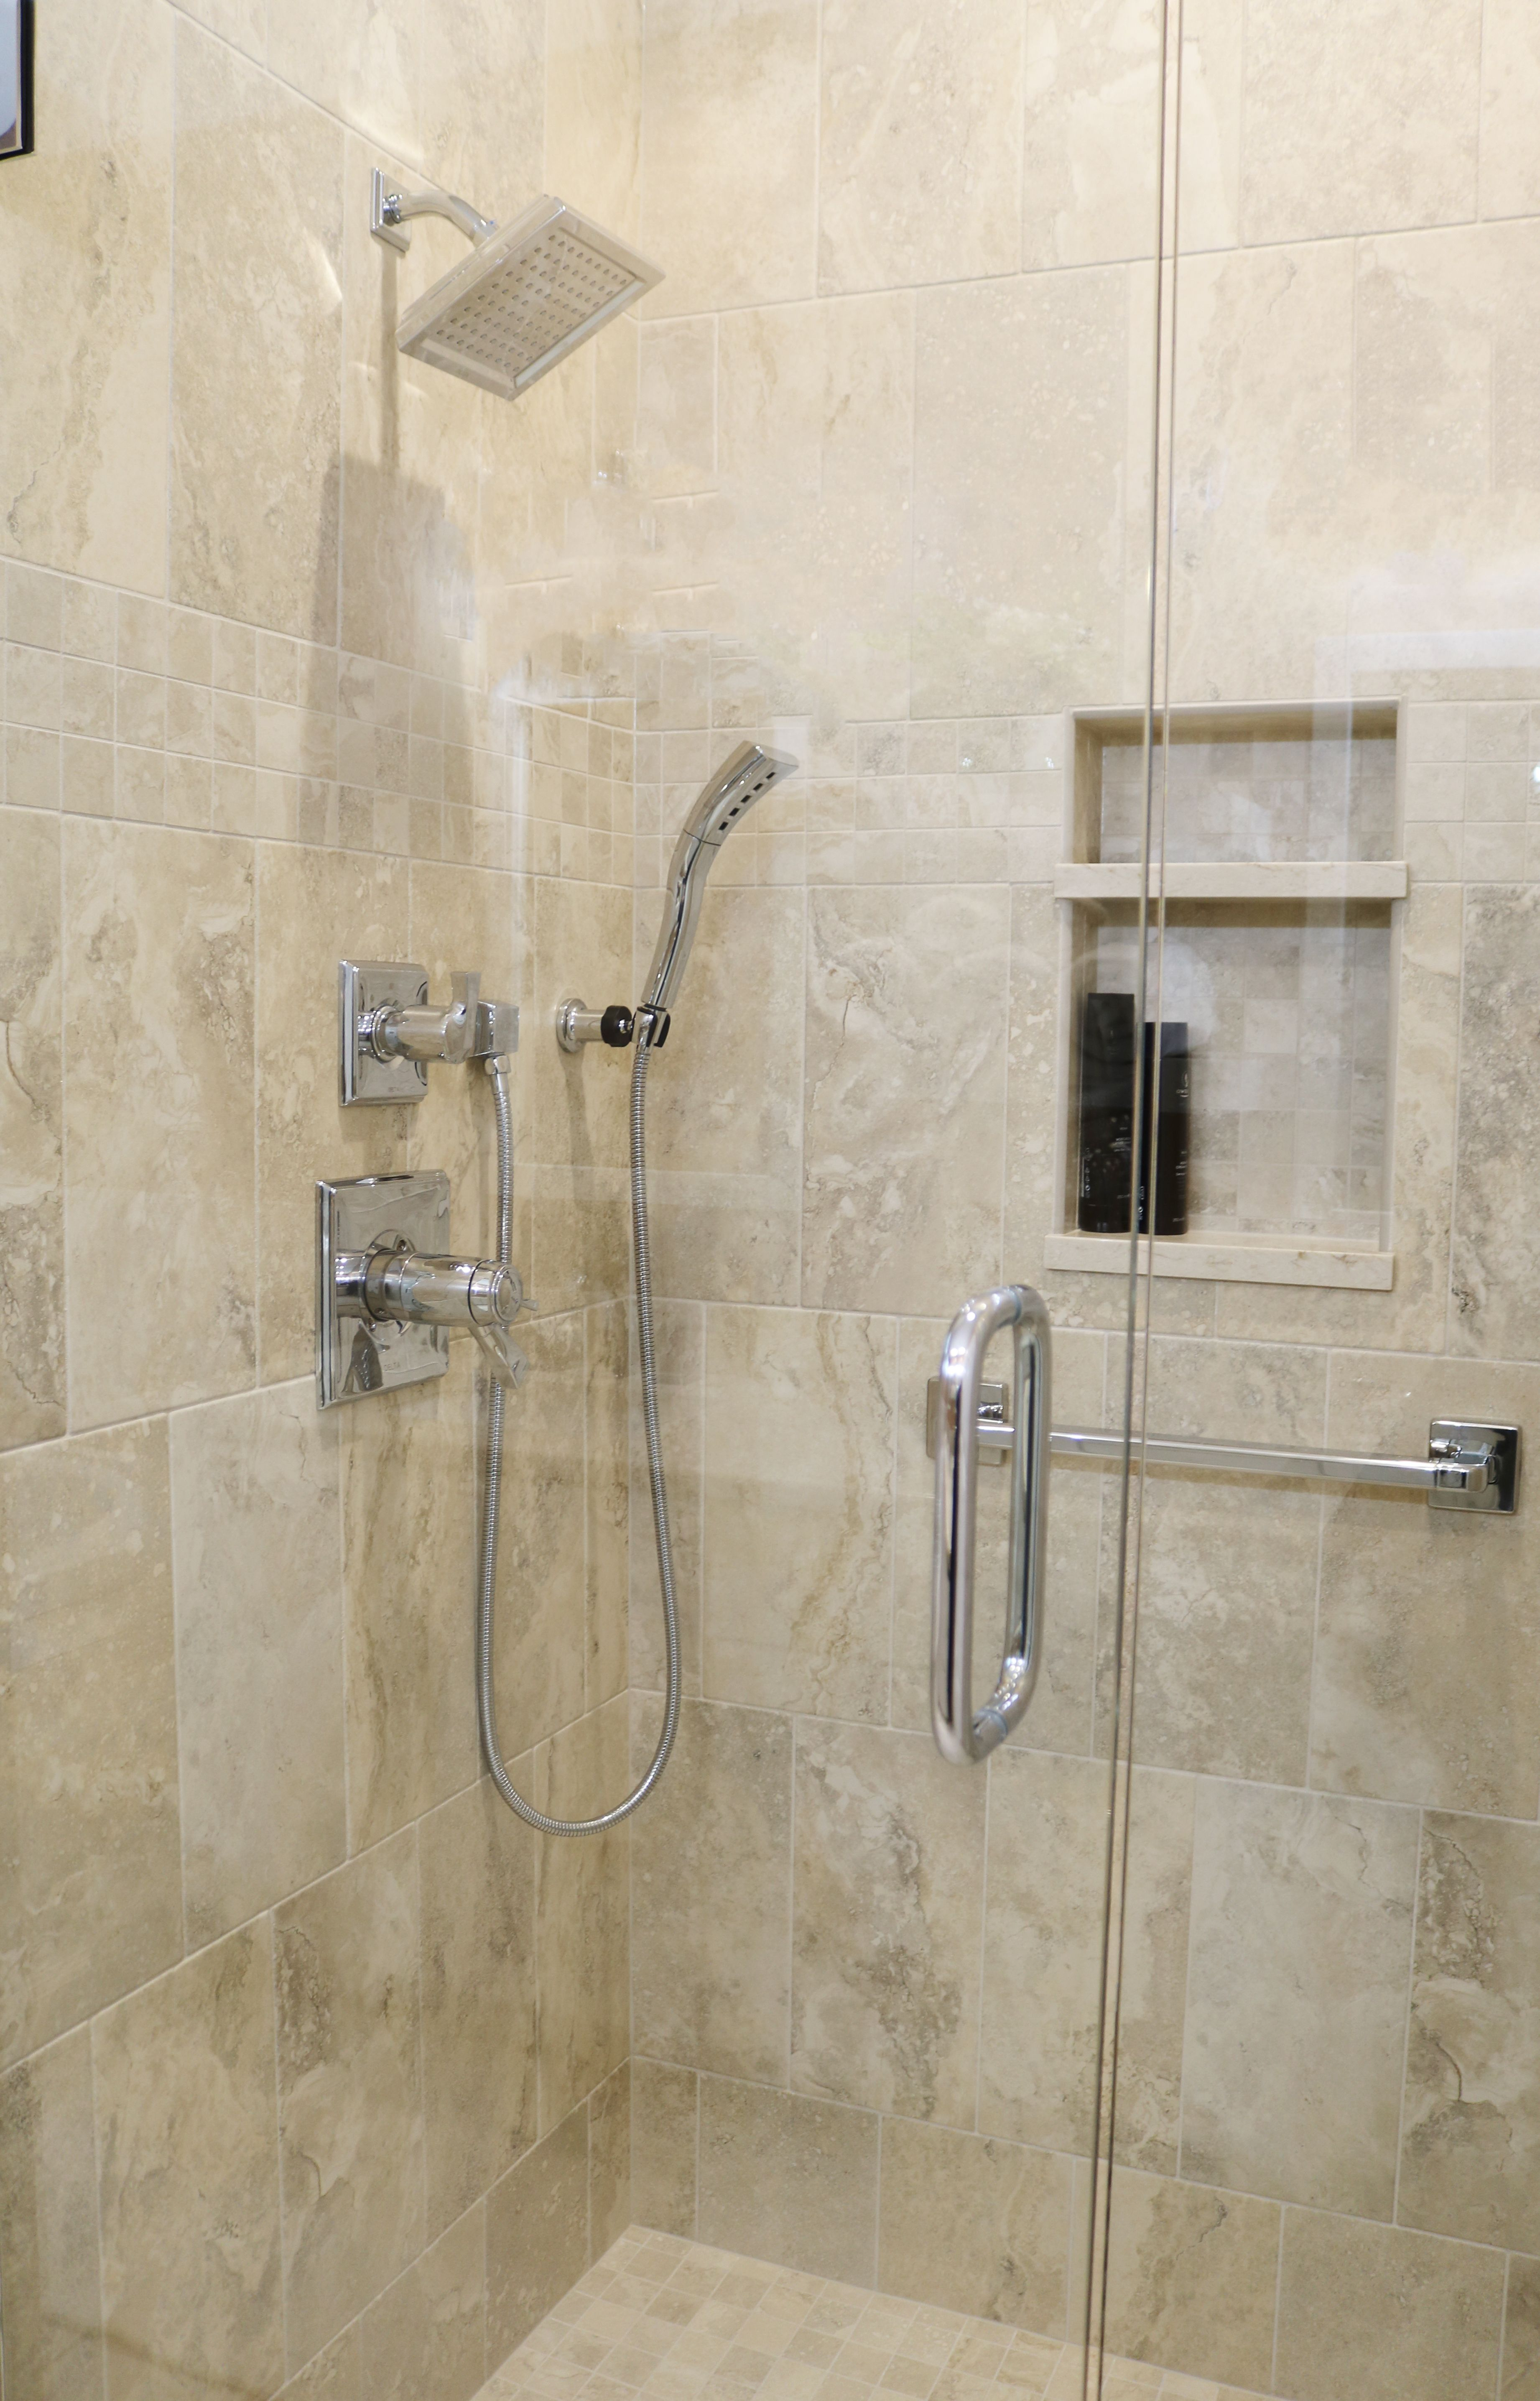 Tile Walk In Shower Delta Faucets Bathroom Tile Walk In Shower Delta Faucets